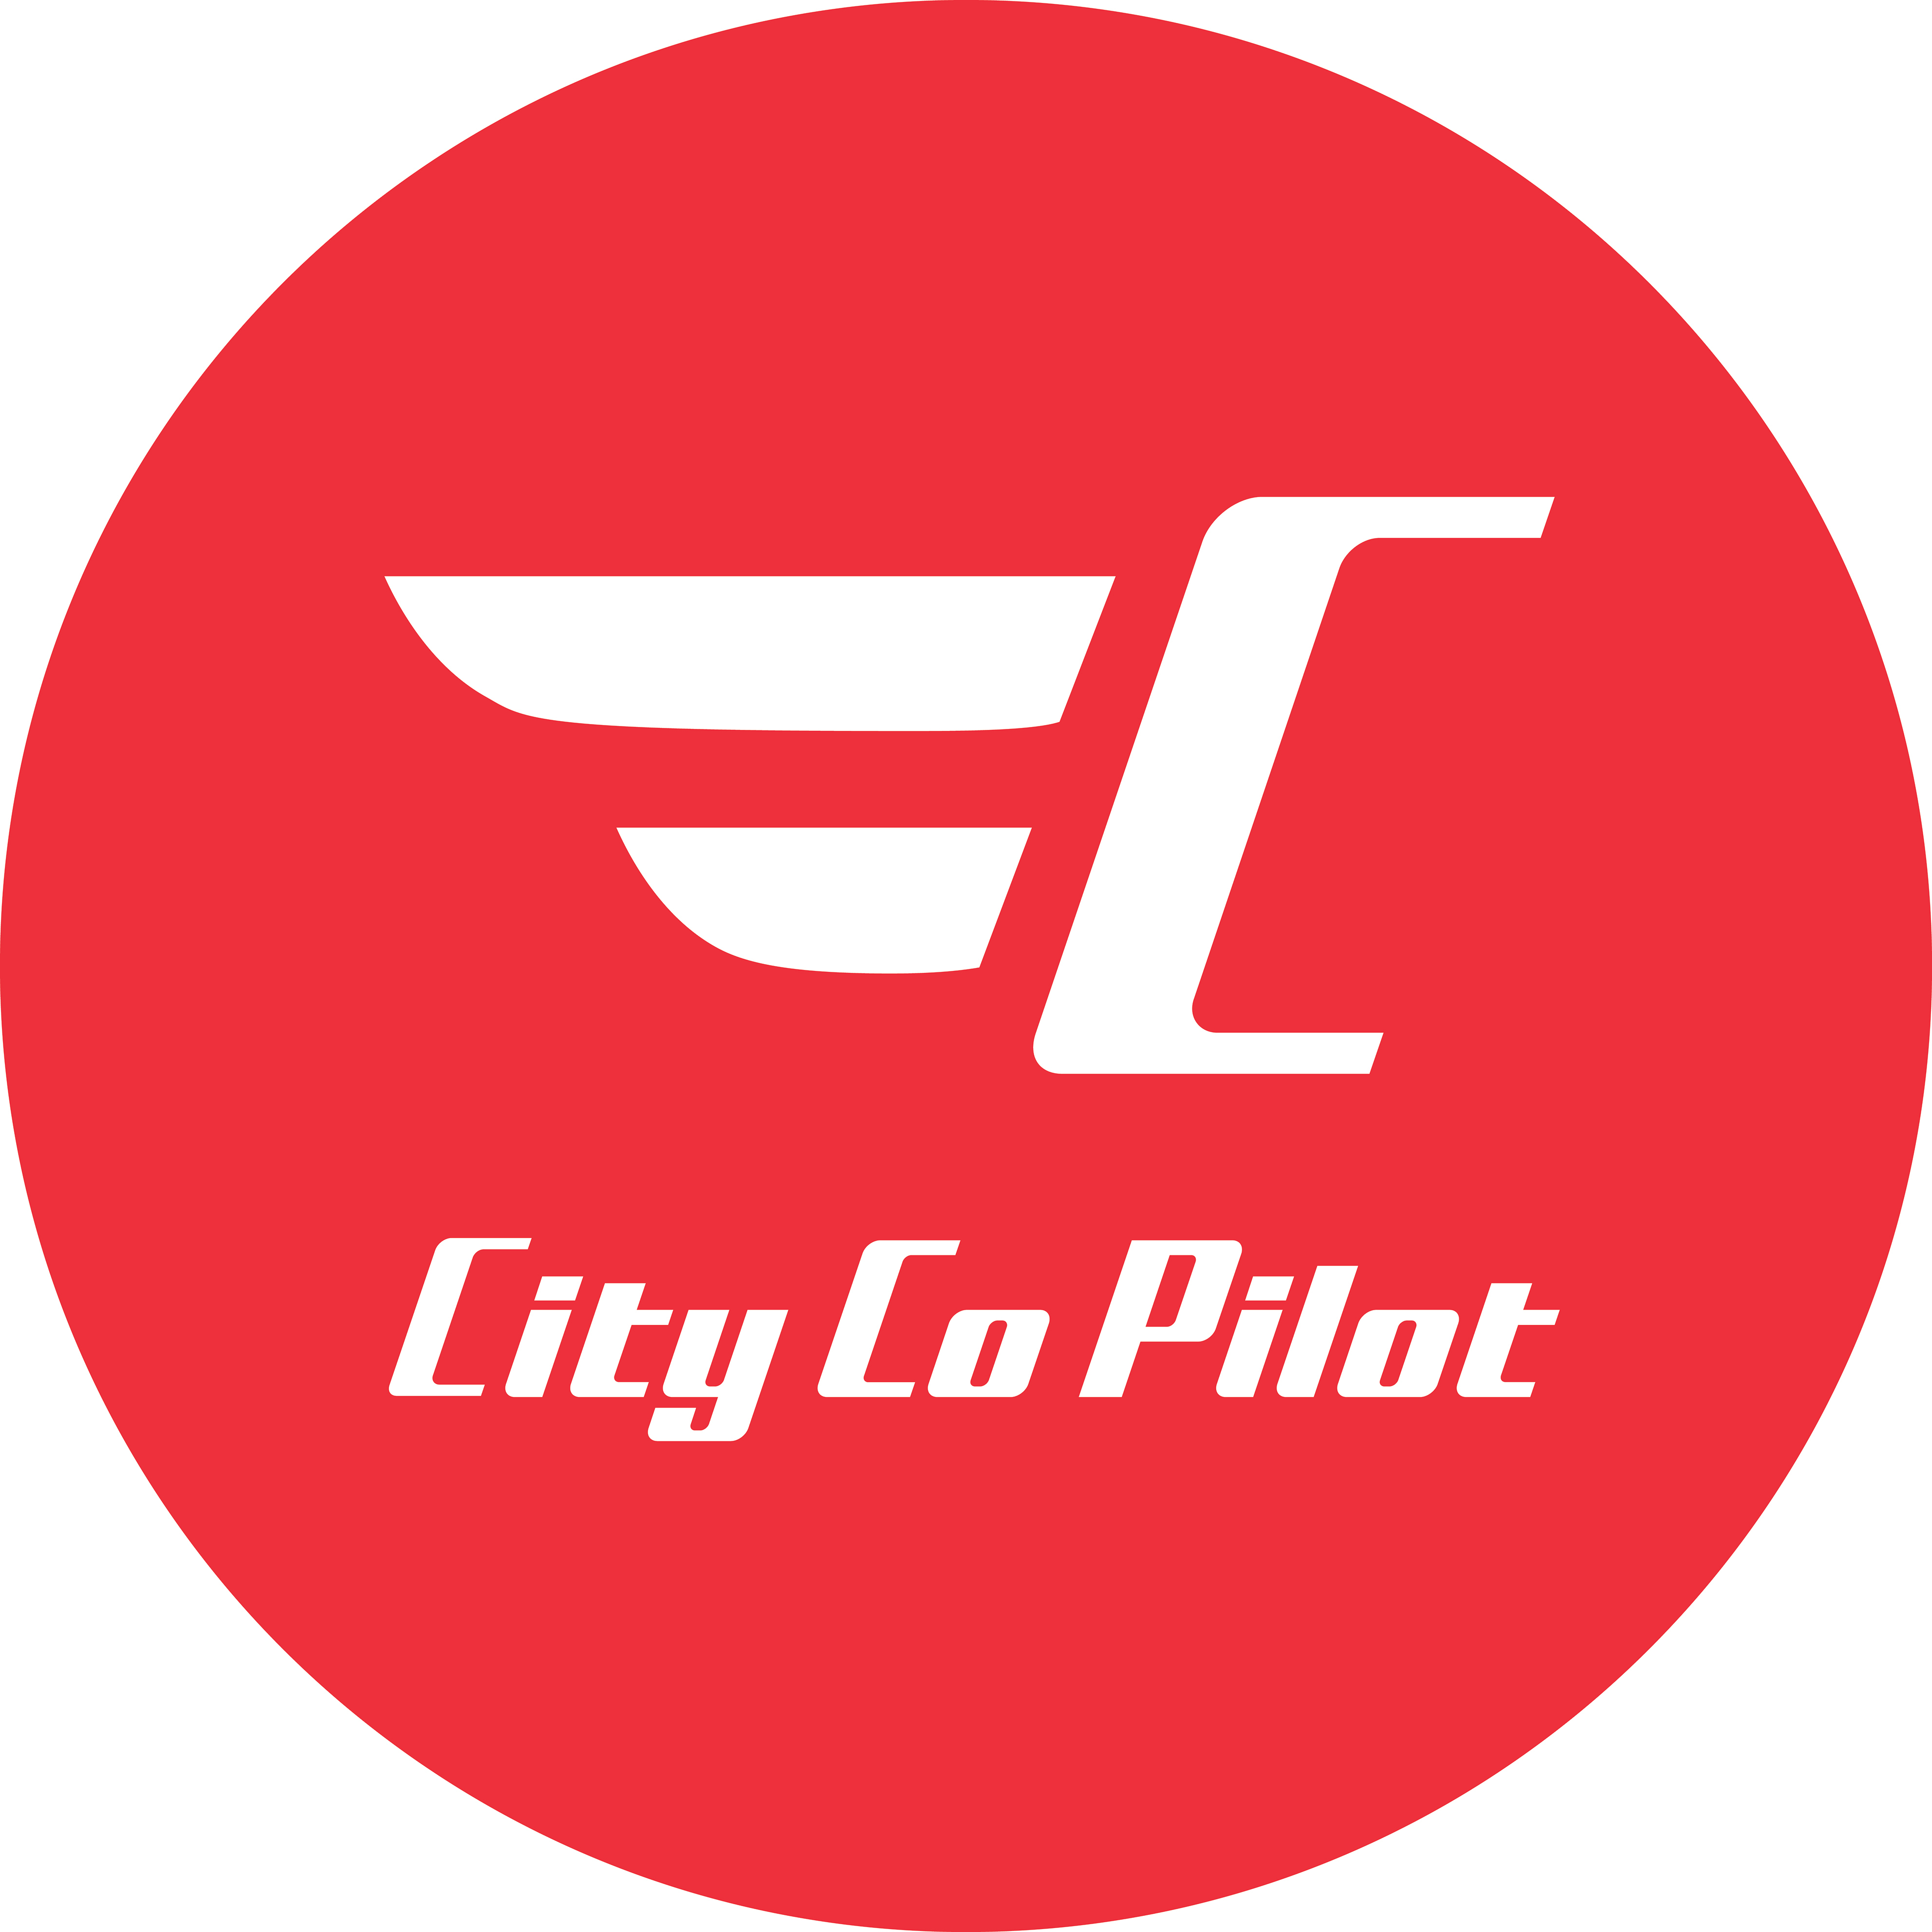 City CoPilot